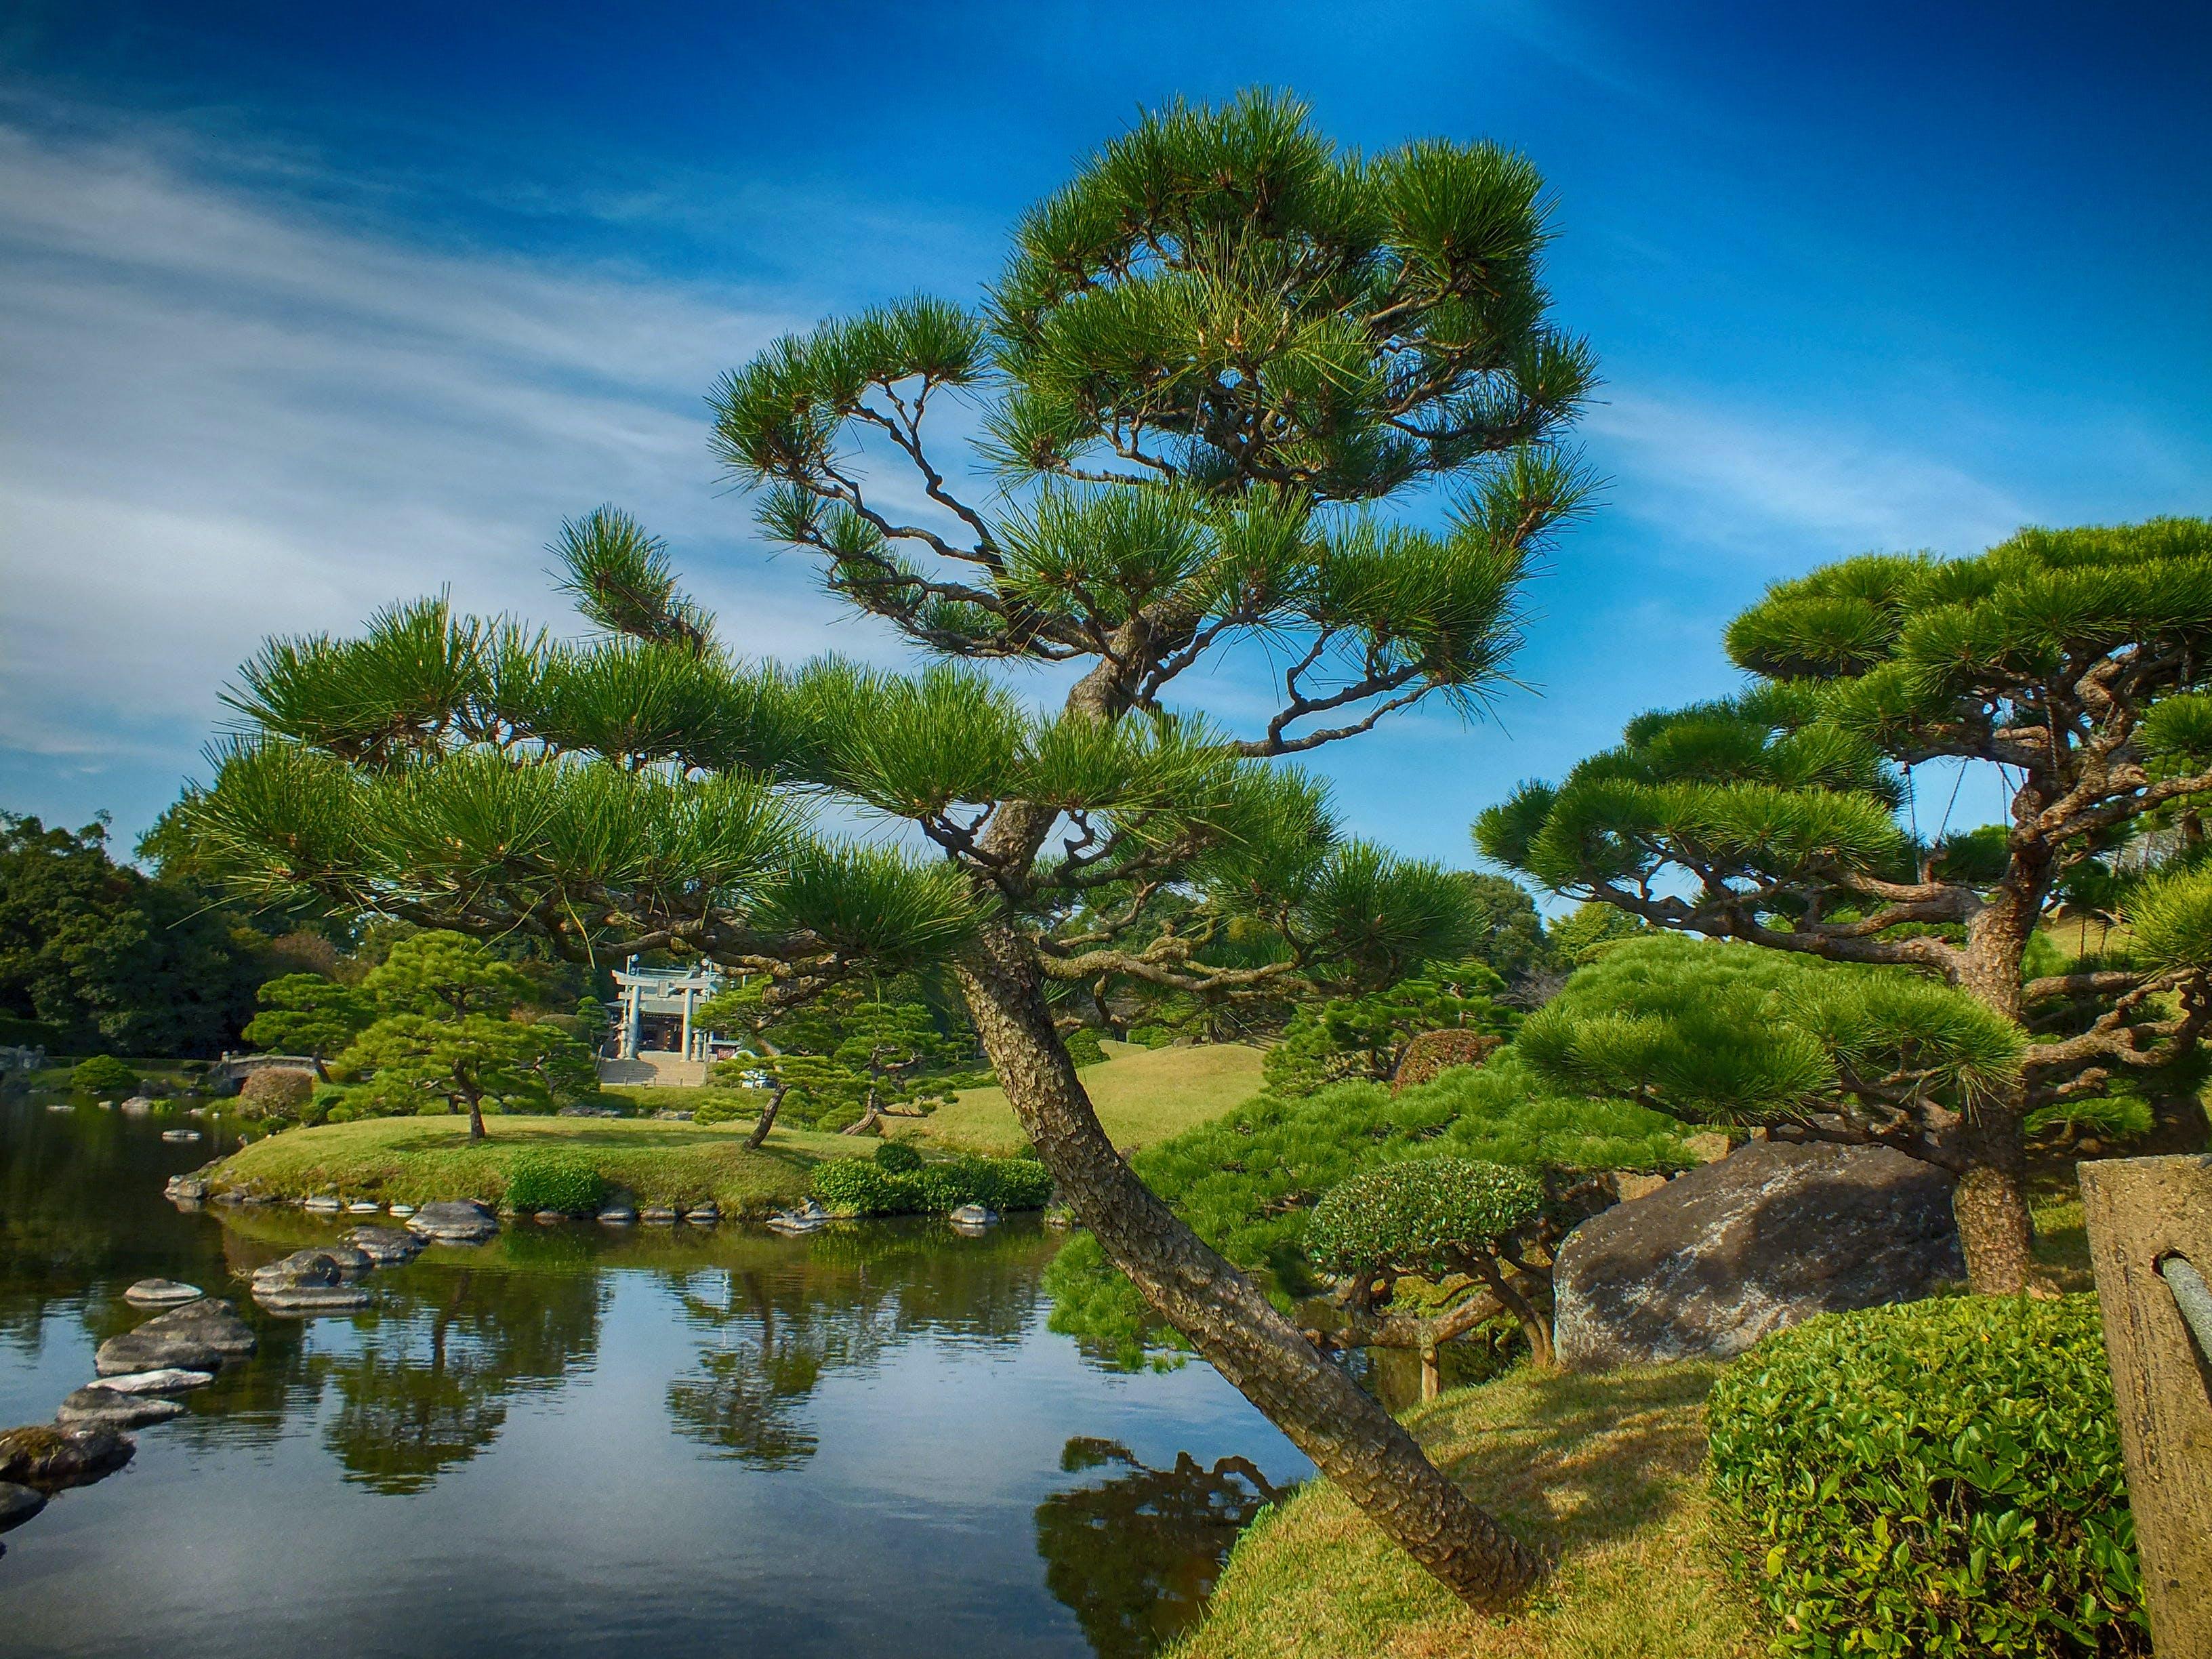 Free stock photo of japan, nature, park, trees